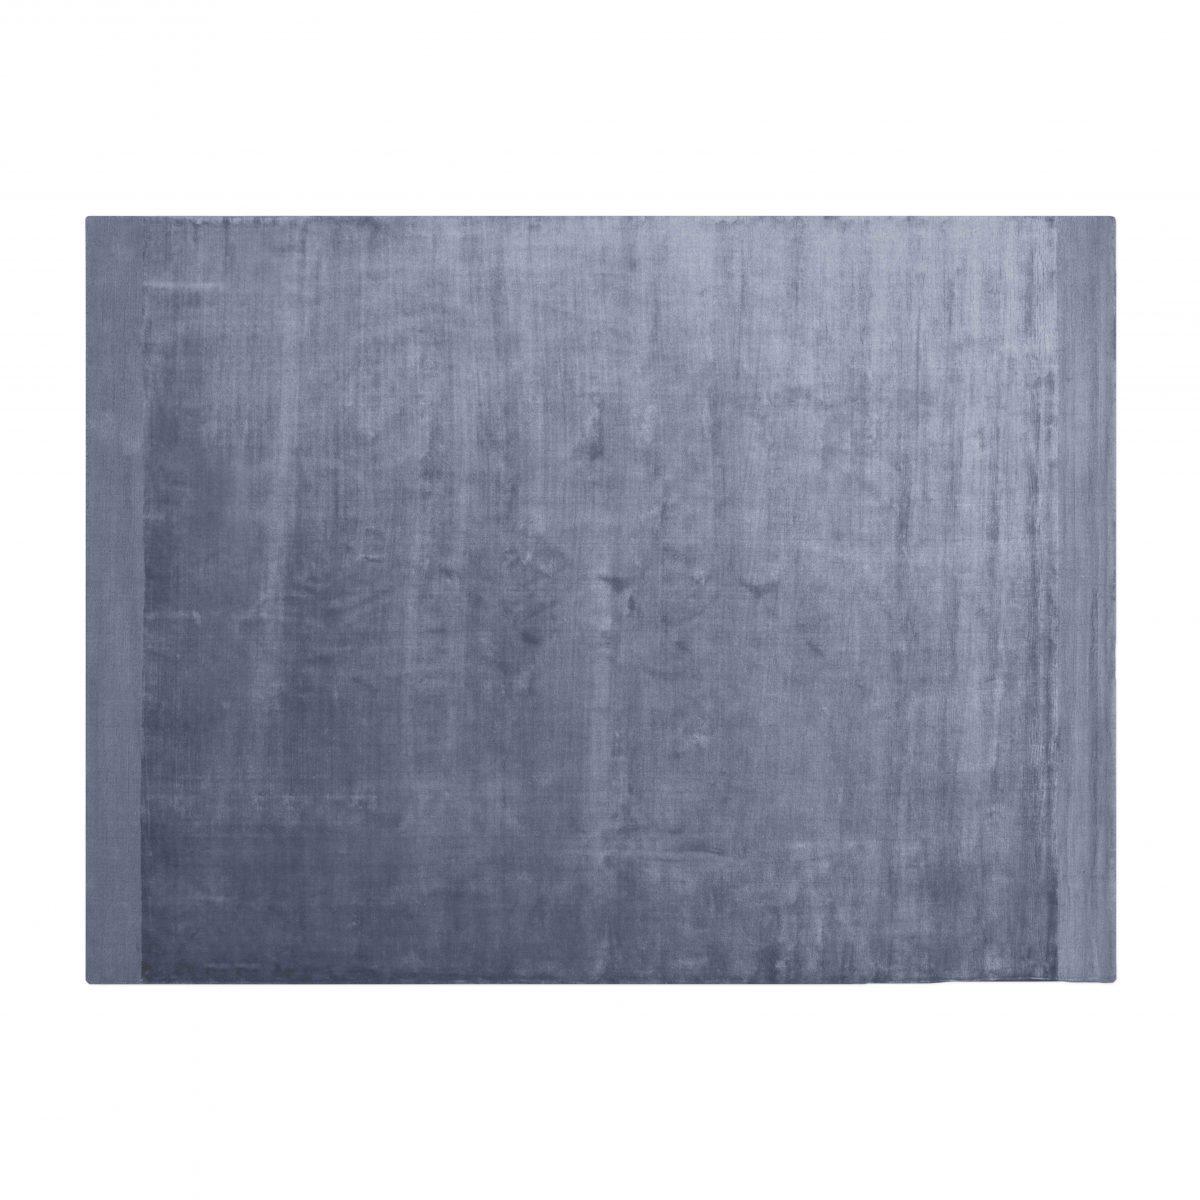 Hem carpet by Patricia Urquiola | Molteni&C